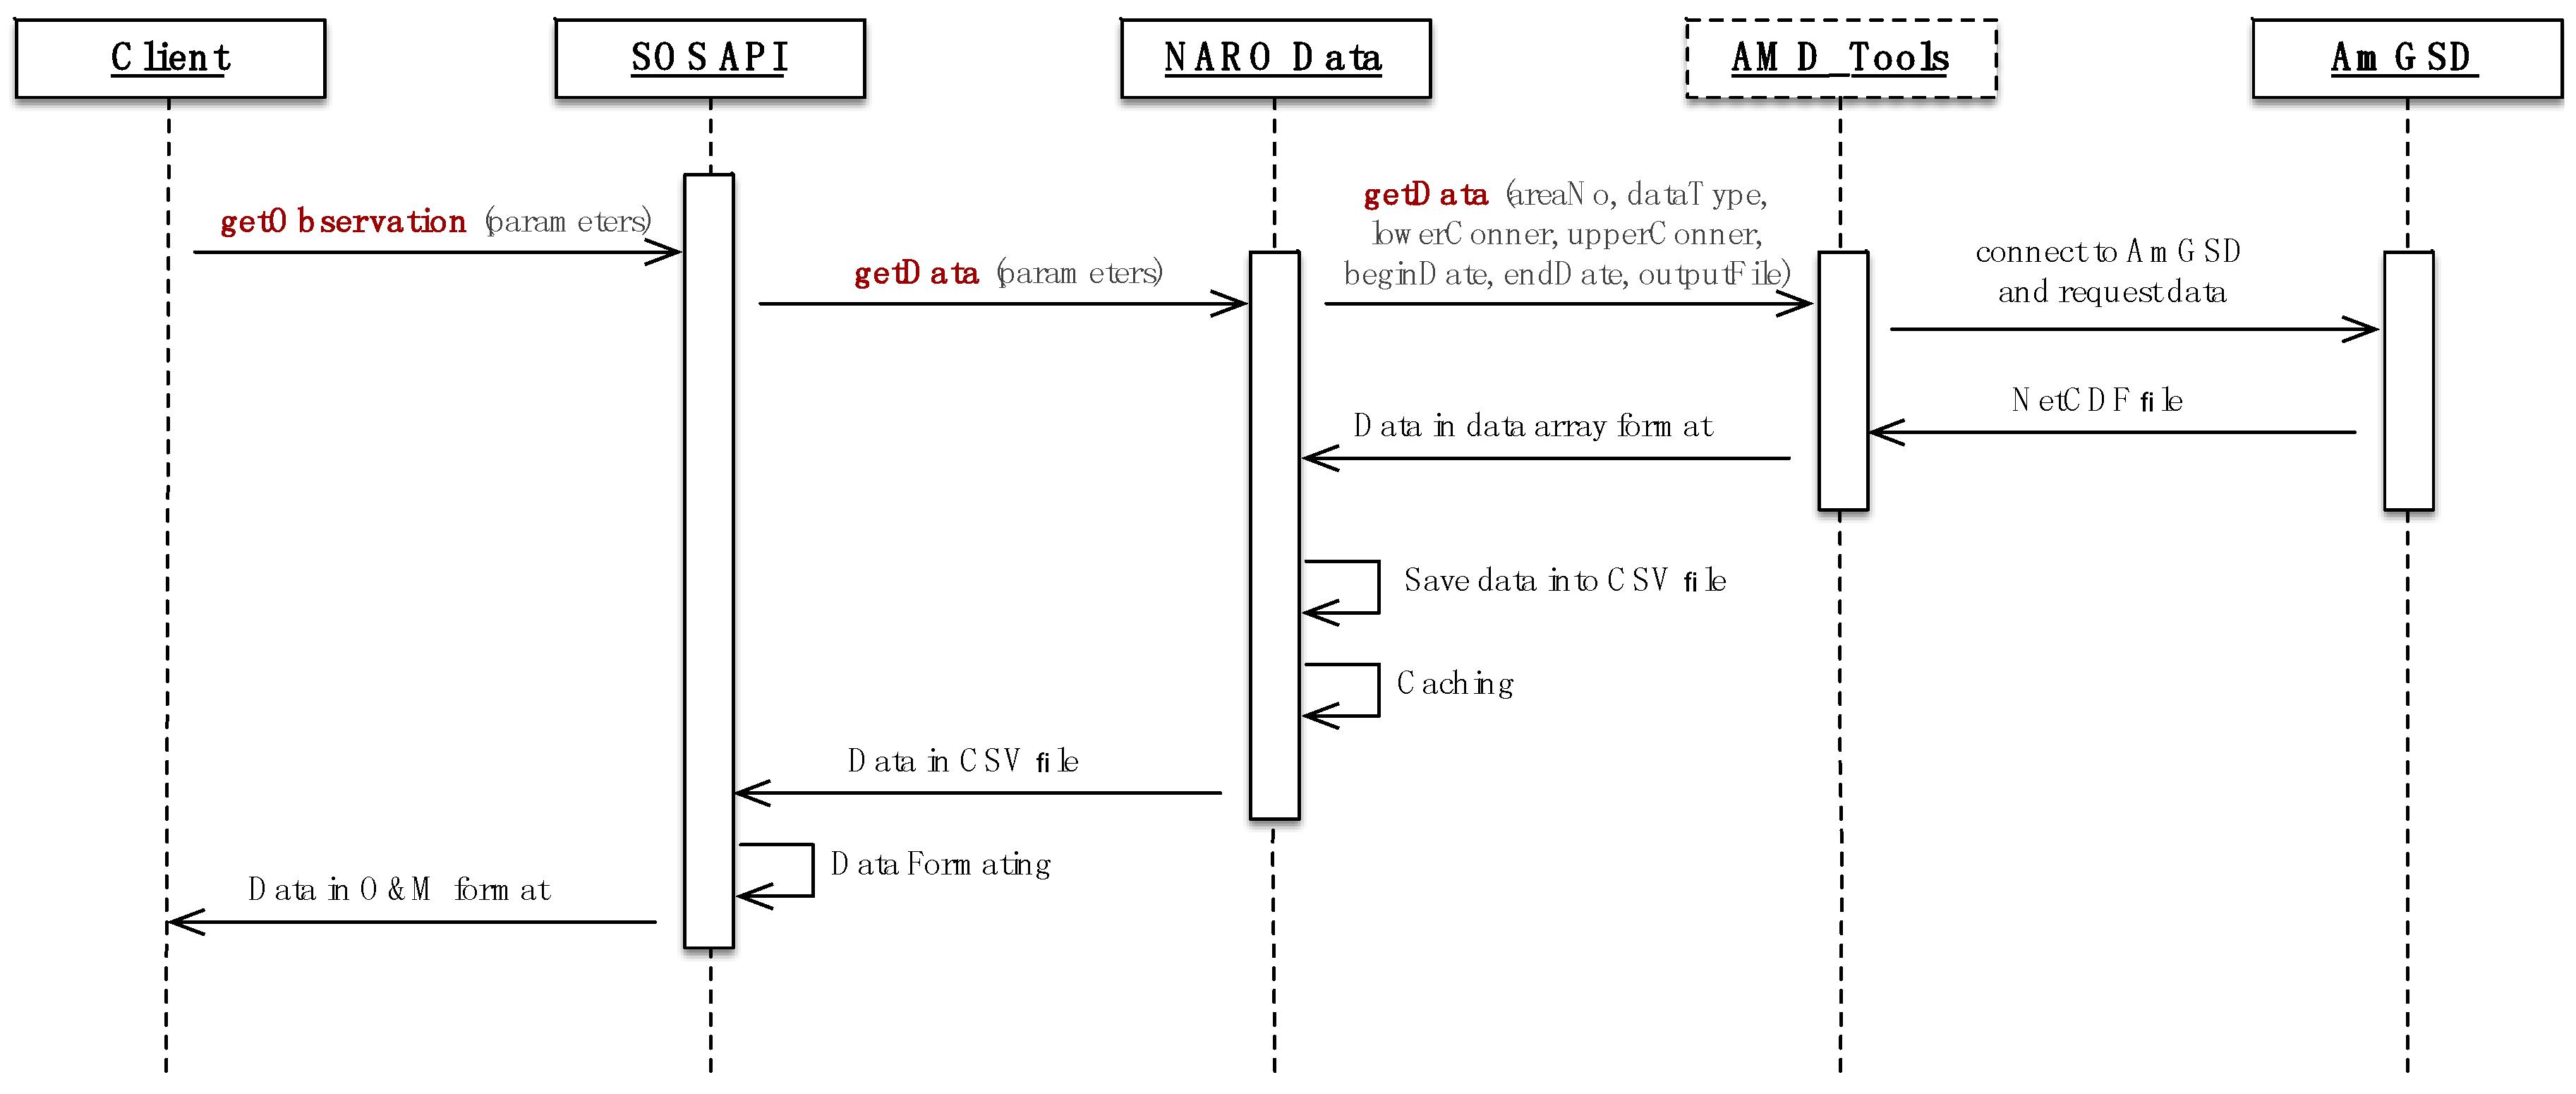 08 Dodge Avenger Wiring Diagram Schematic 2019 2008 Radio Regulator Caliber Stereo